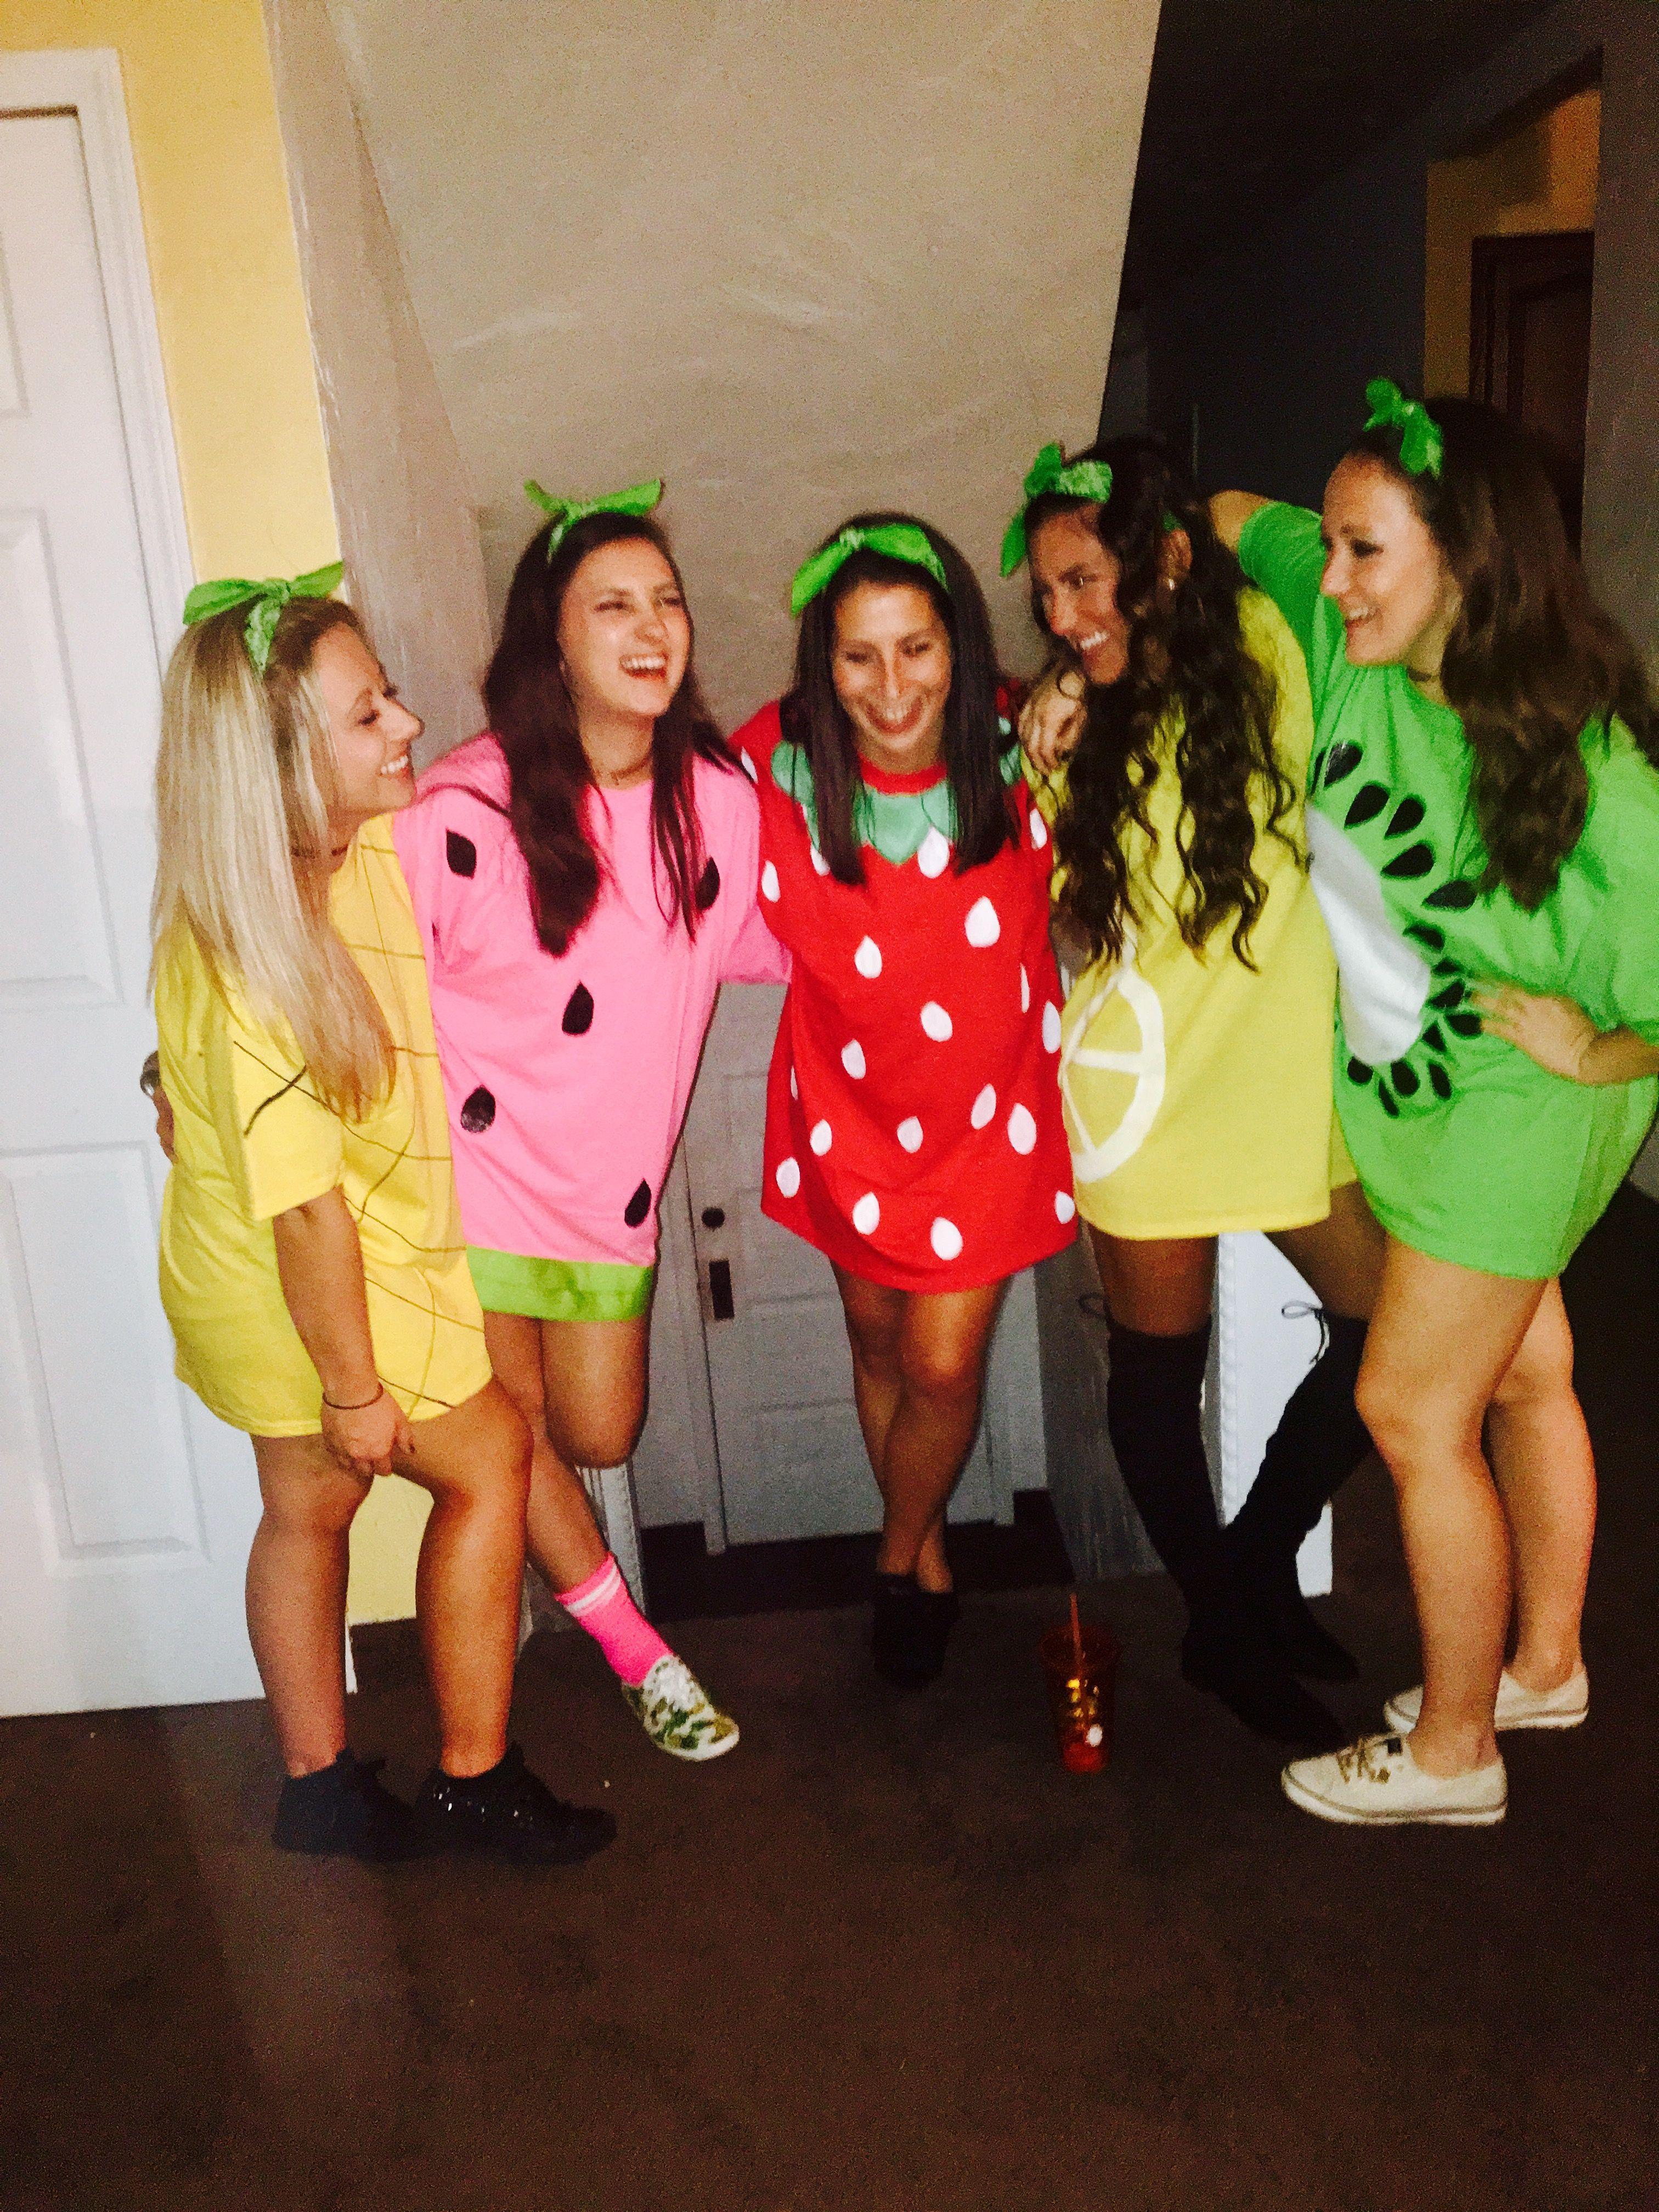 3 Person Costume Ideas : person, costume, ideas, Fruit, Halloween, Costume, #fruity, #halloween, #costume, Person, Costumes,, Costumes, Teens, Girls